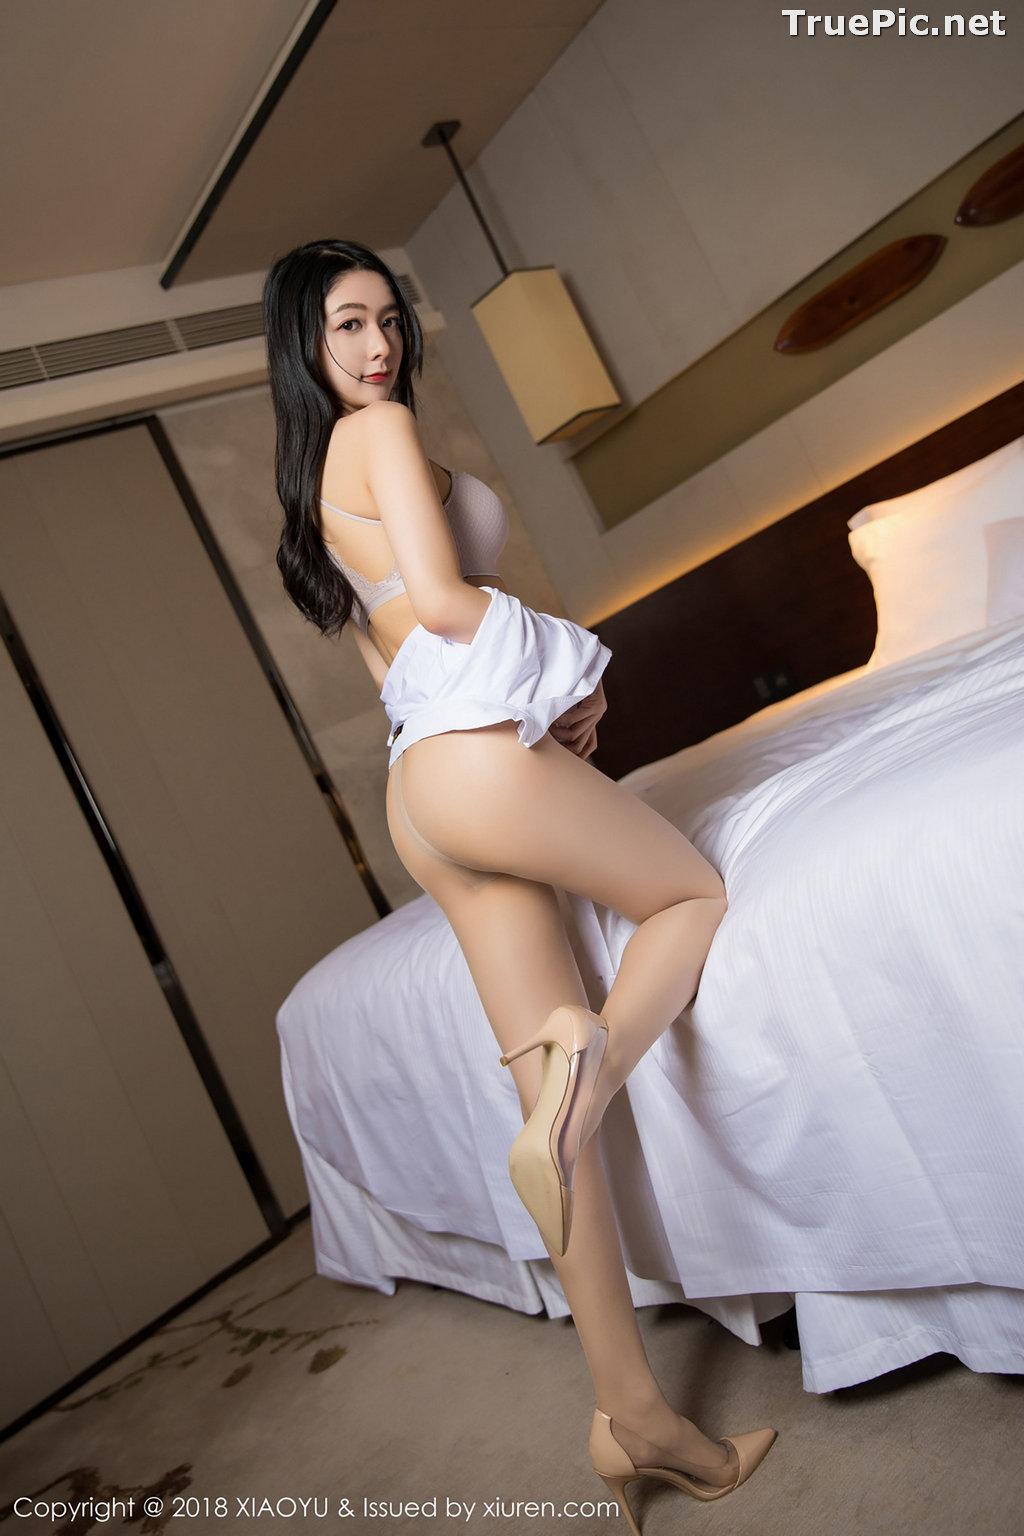 Image XiaoYu No.004 - Chinese Model - Xiao Reba (Angela喜欢猫) - White Sexy Nurse - TruePic.net - Picture-34